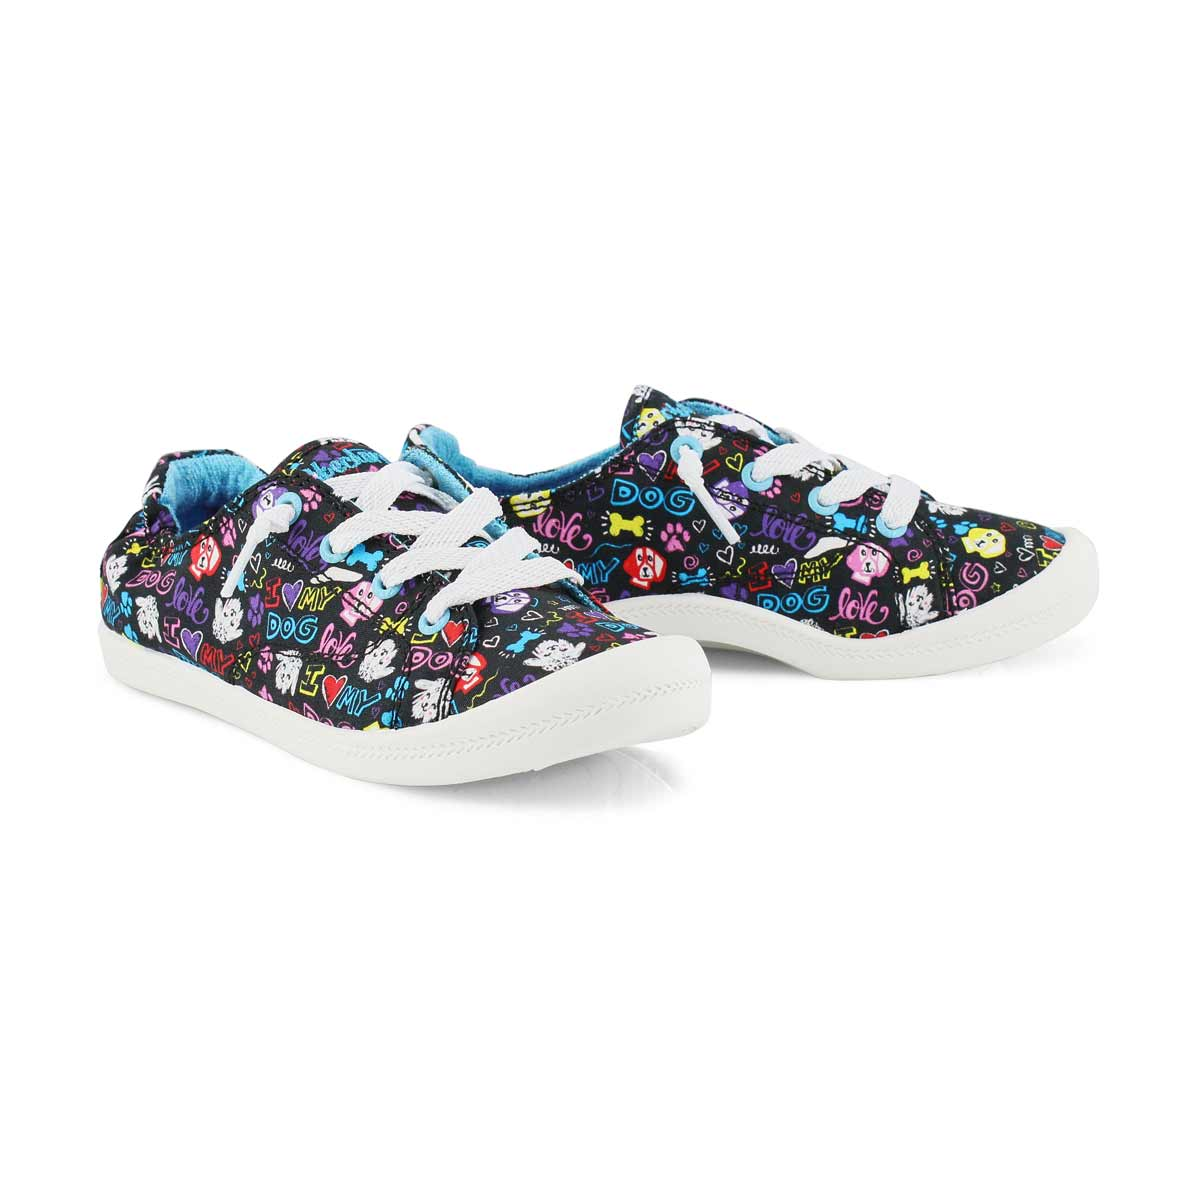 Girls' Beach Bingo Sneakers - Black/Multi